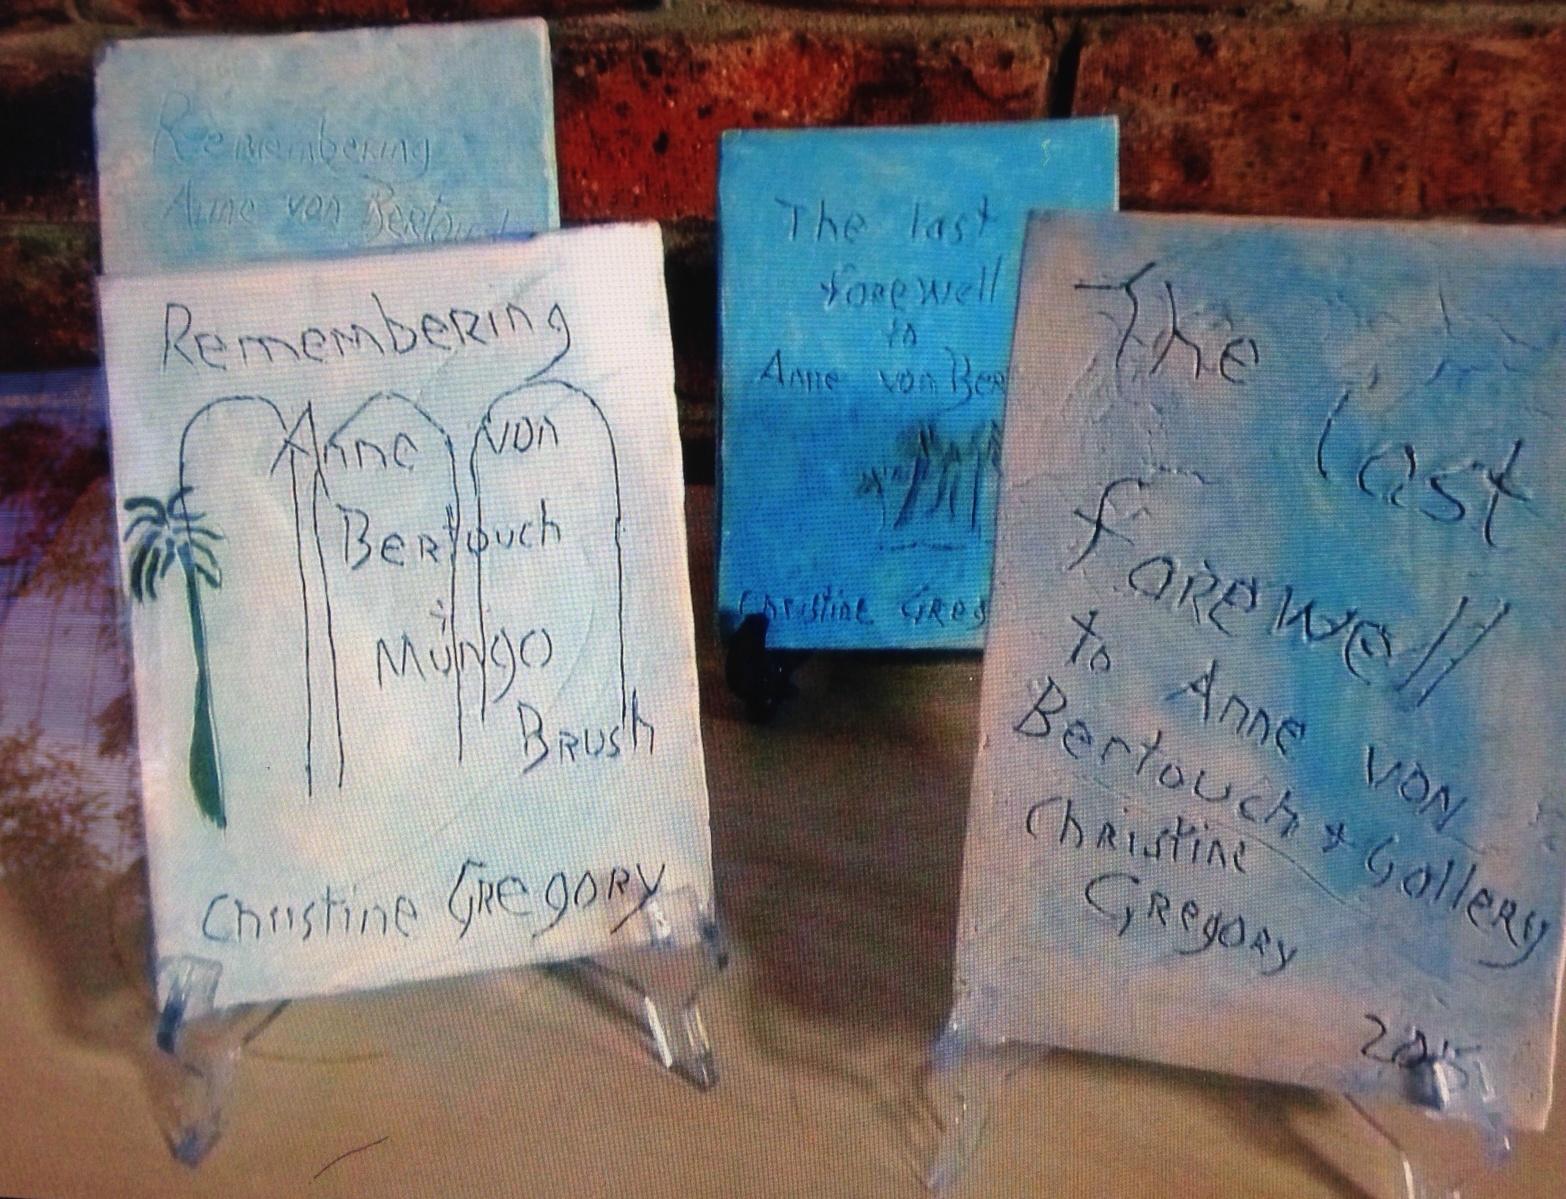 Christine Gregory - Tablet Memories of Mungo Brush.JPG